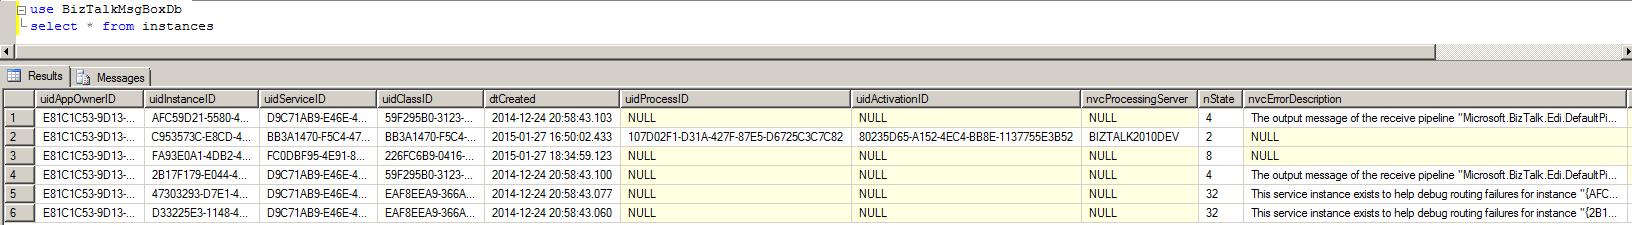 BiztalkMsgBoxDB_Instances_data